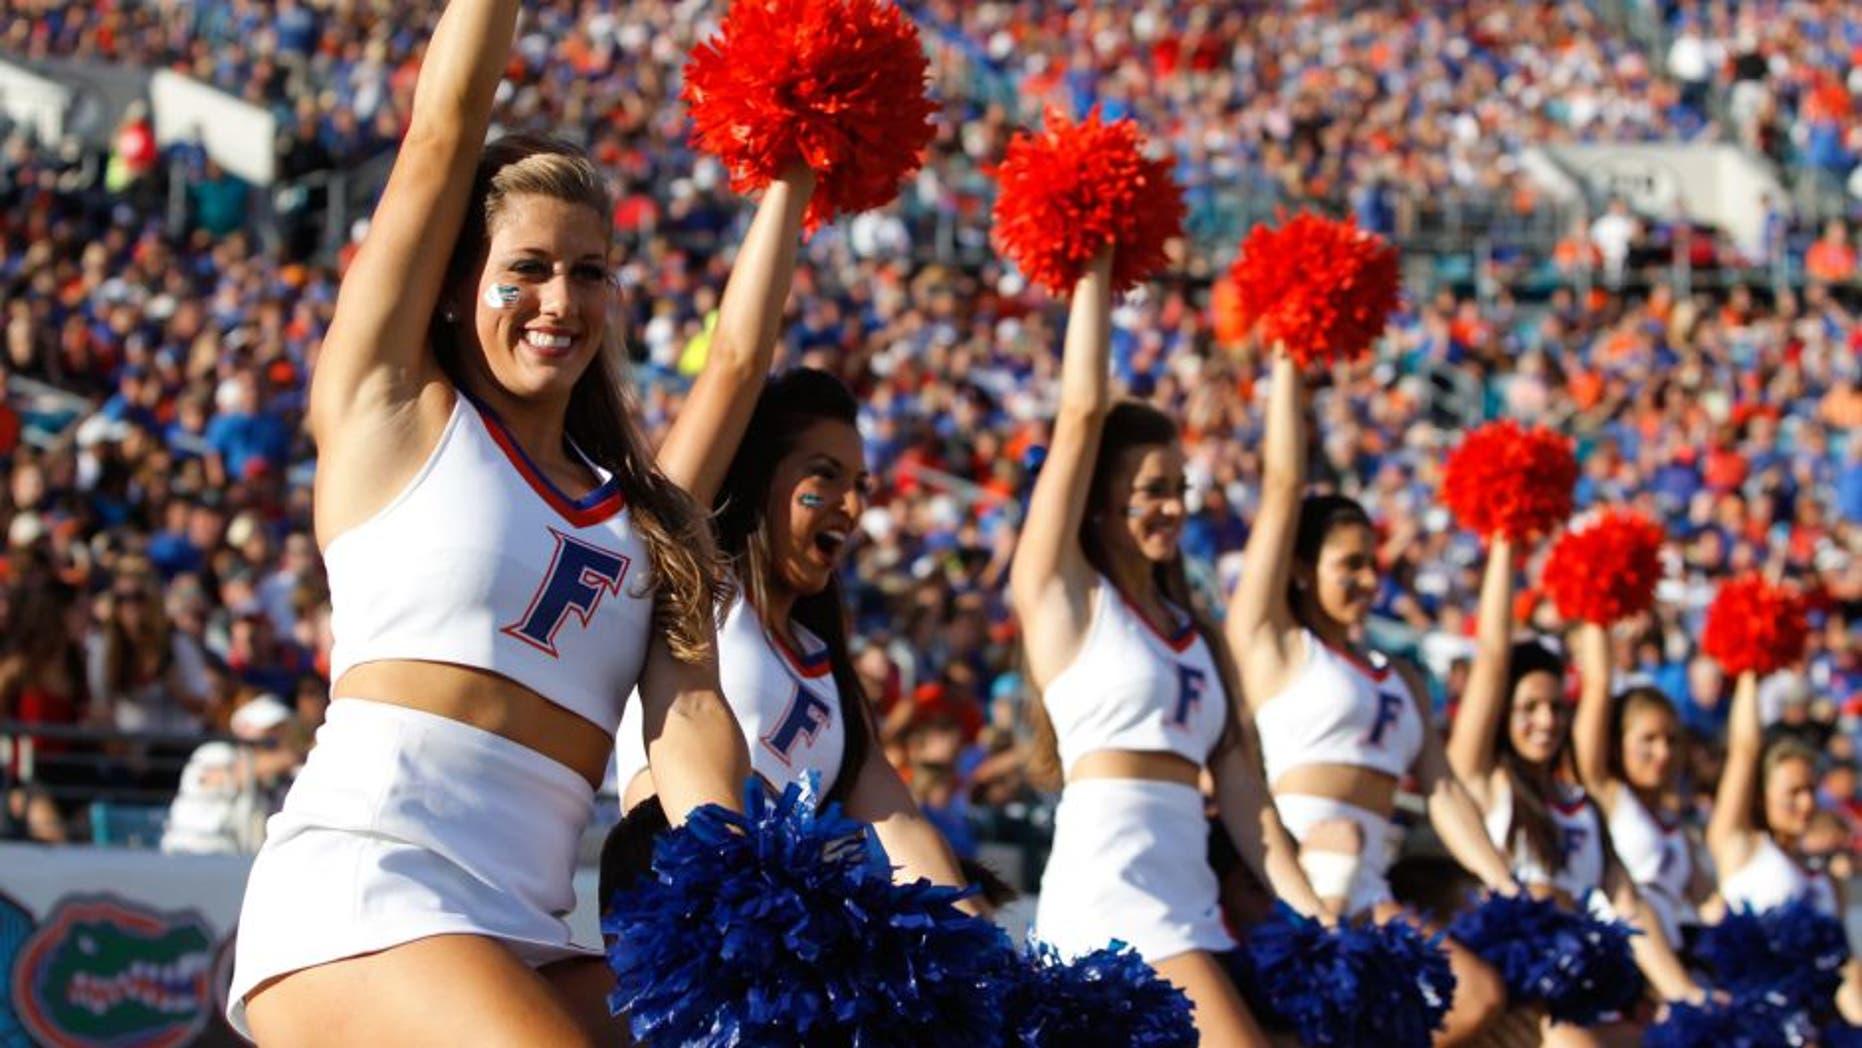 Nov 2, 2013; Jacksonville, FL, USA; Florida Gators cheerleaders cheer against the Georgia Bulldogs during the second quarter at EverBank Field. Mandatory Credit: Kim Klement-USA TODAY Sports